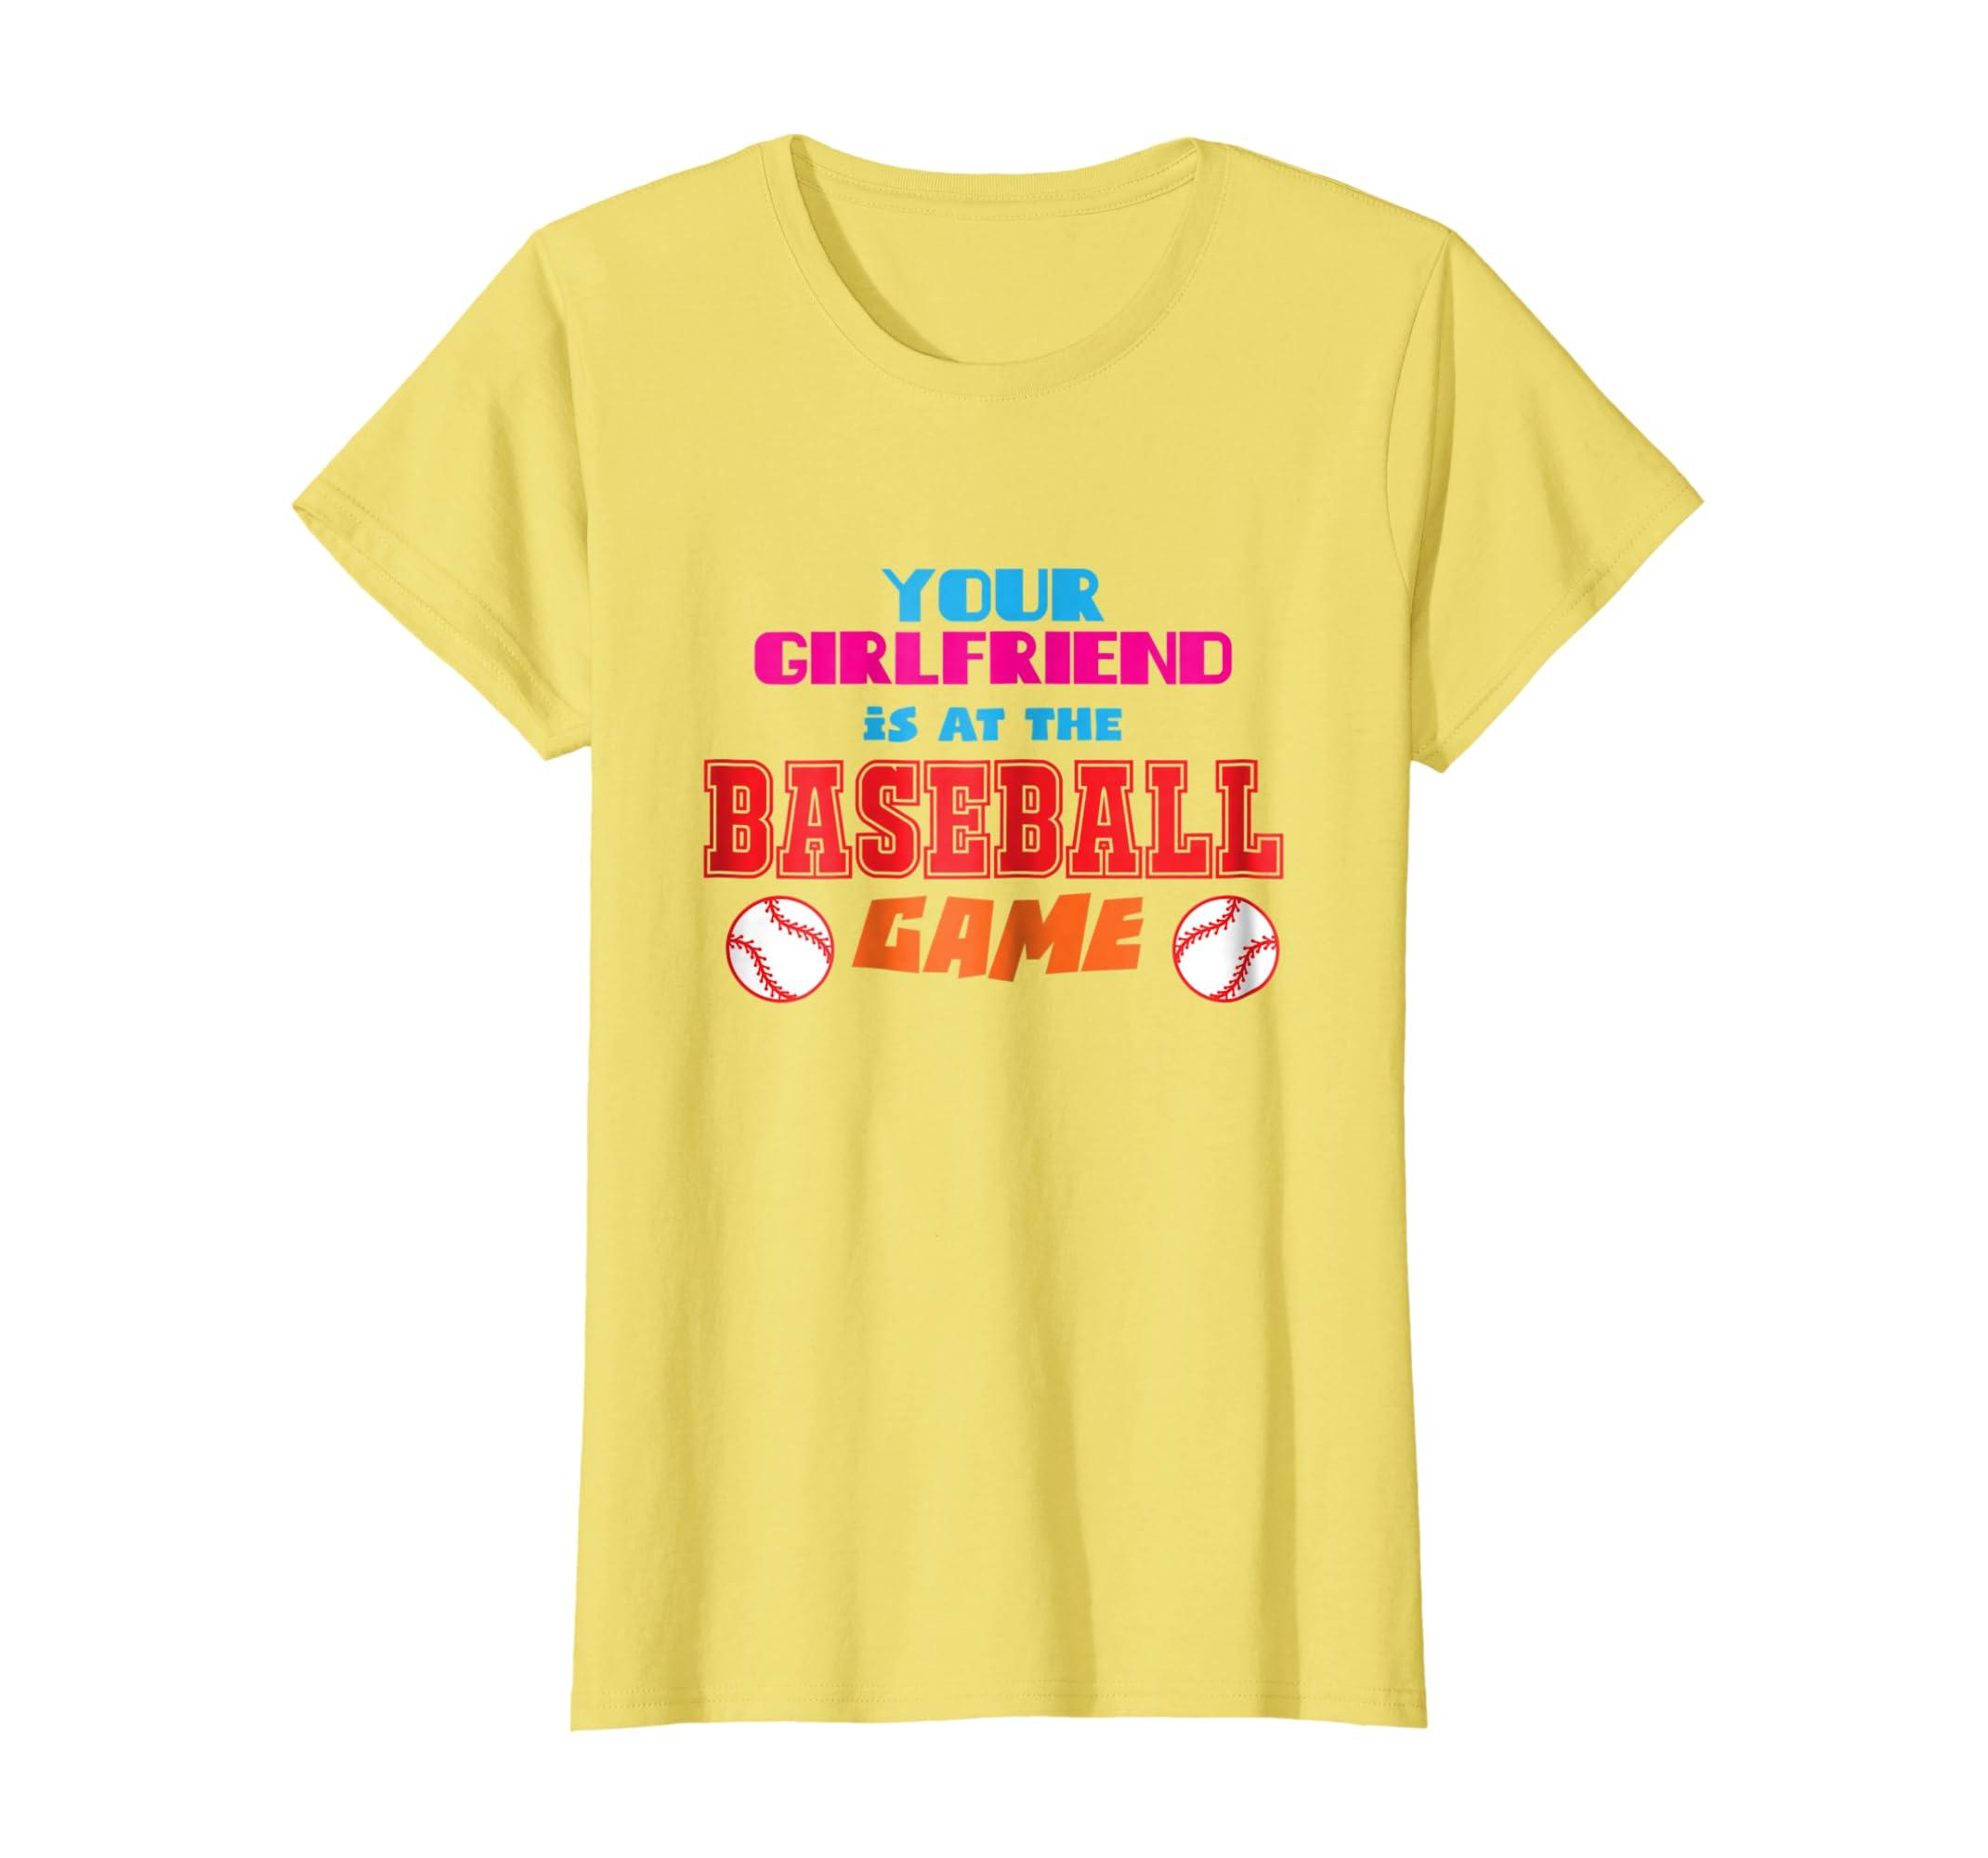 99dae86e30a Amazon.com: Funny Baseball Shirts for Girlfriend Sports T-Shirts ...